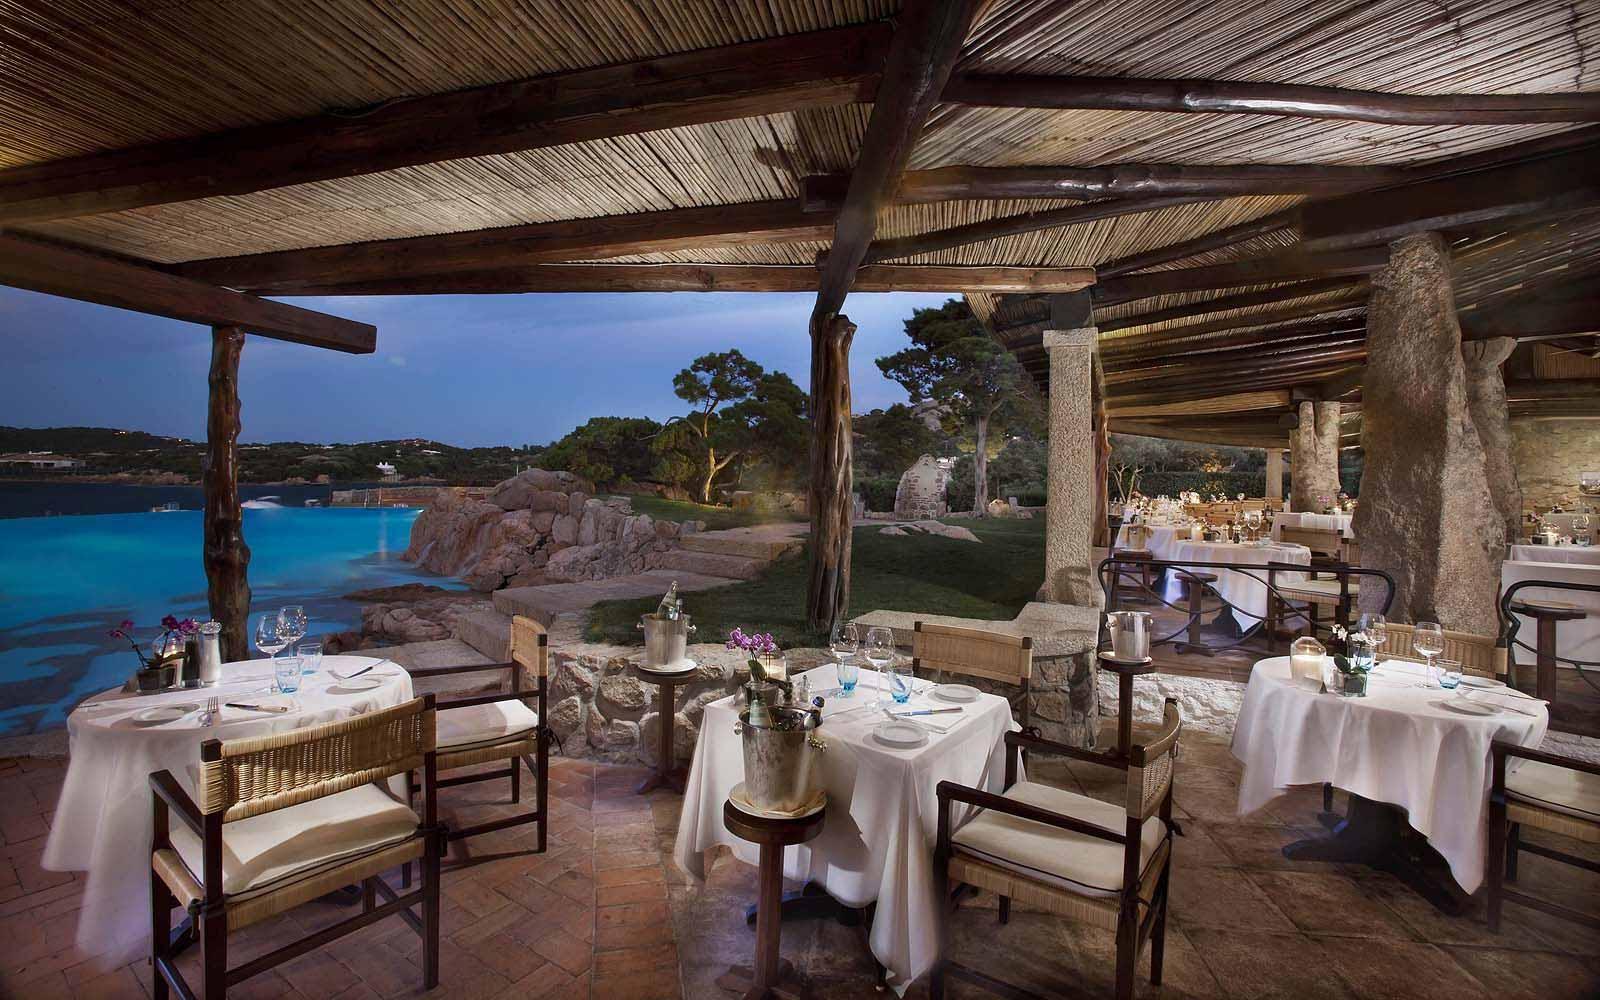 Pitrizza Restaurant at the Hotel Pitrizza